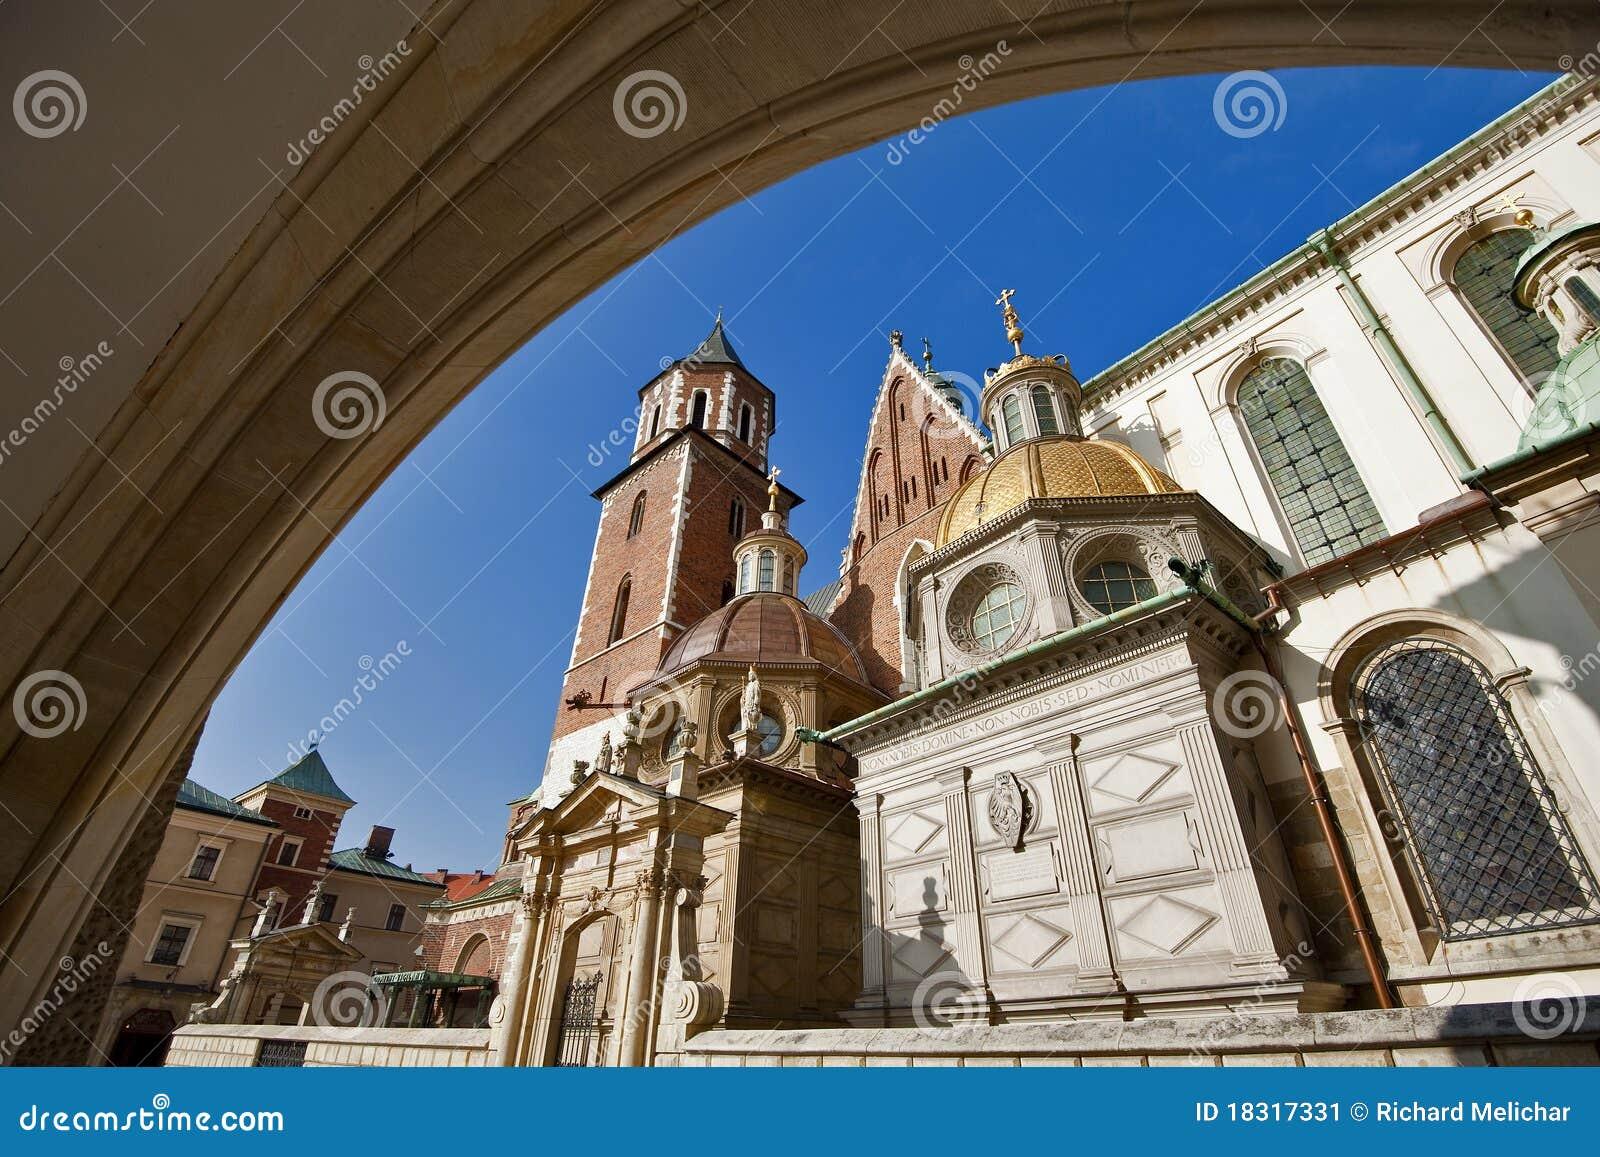 Saint Stanislas Cathedral at Wawel castle, Krakow